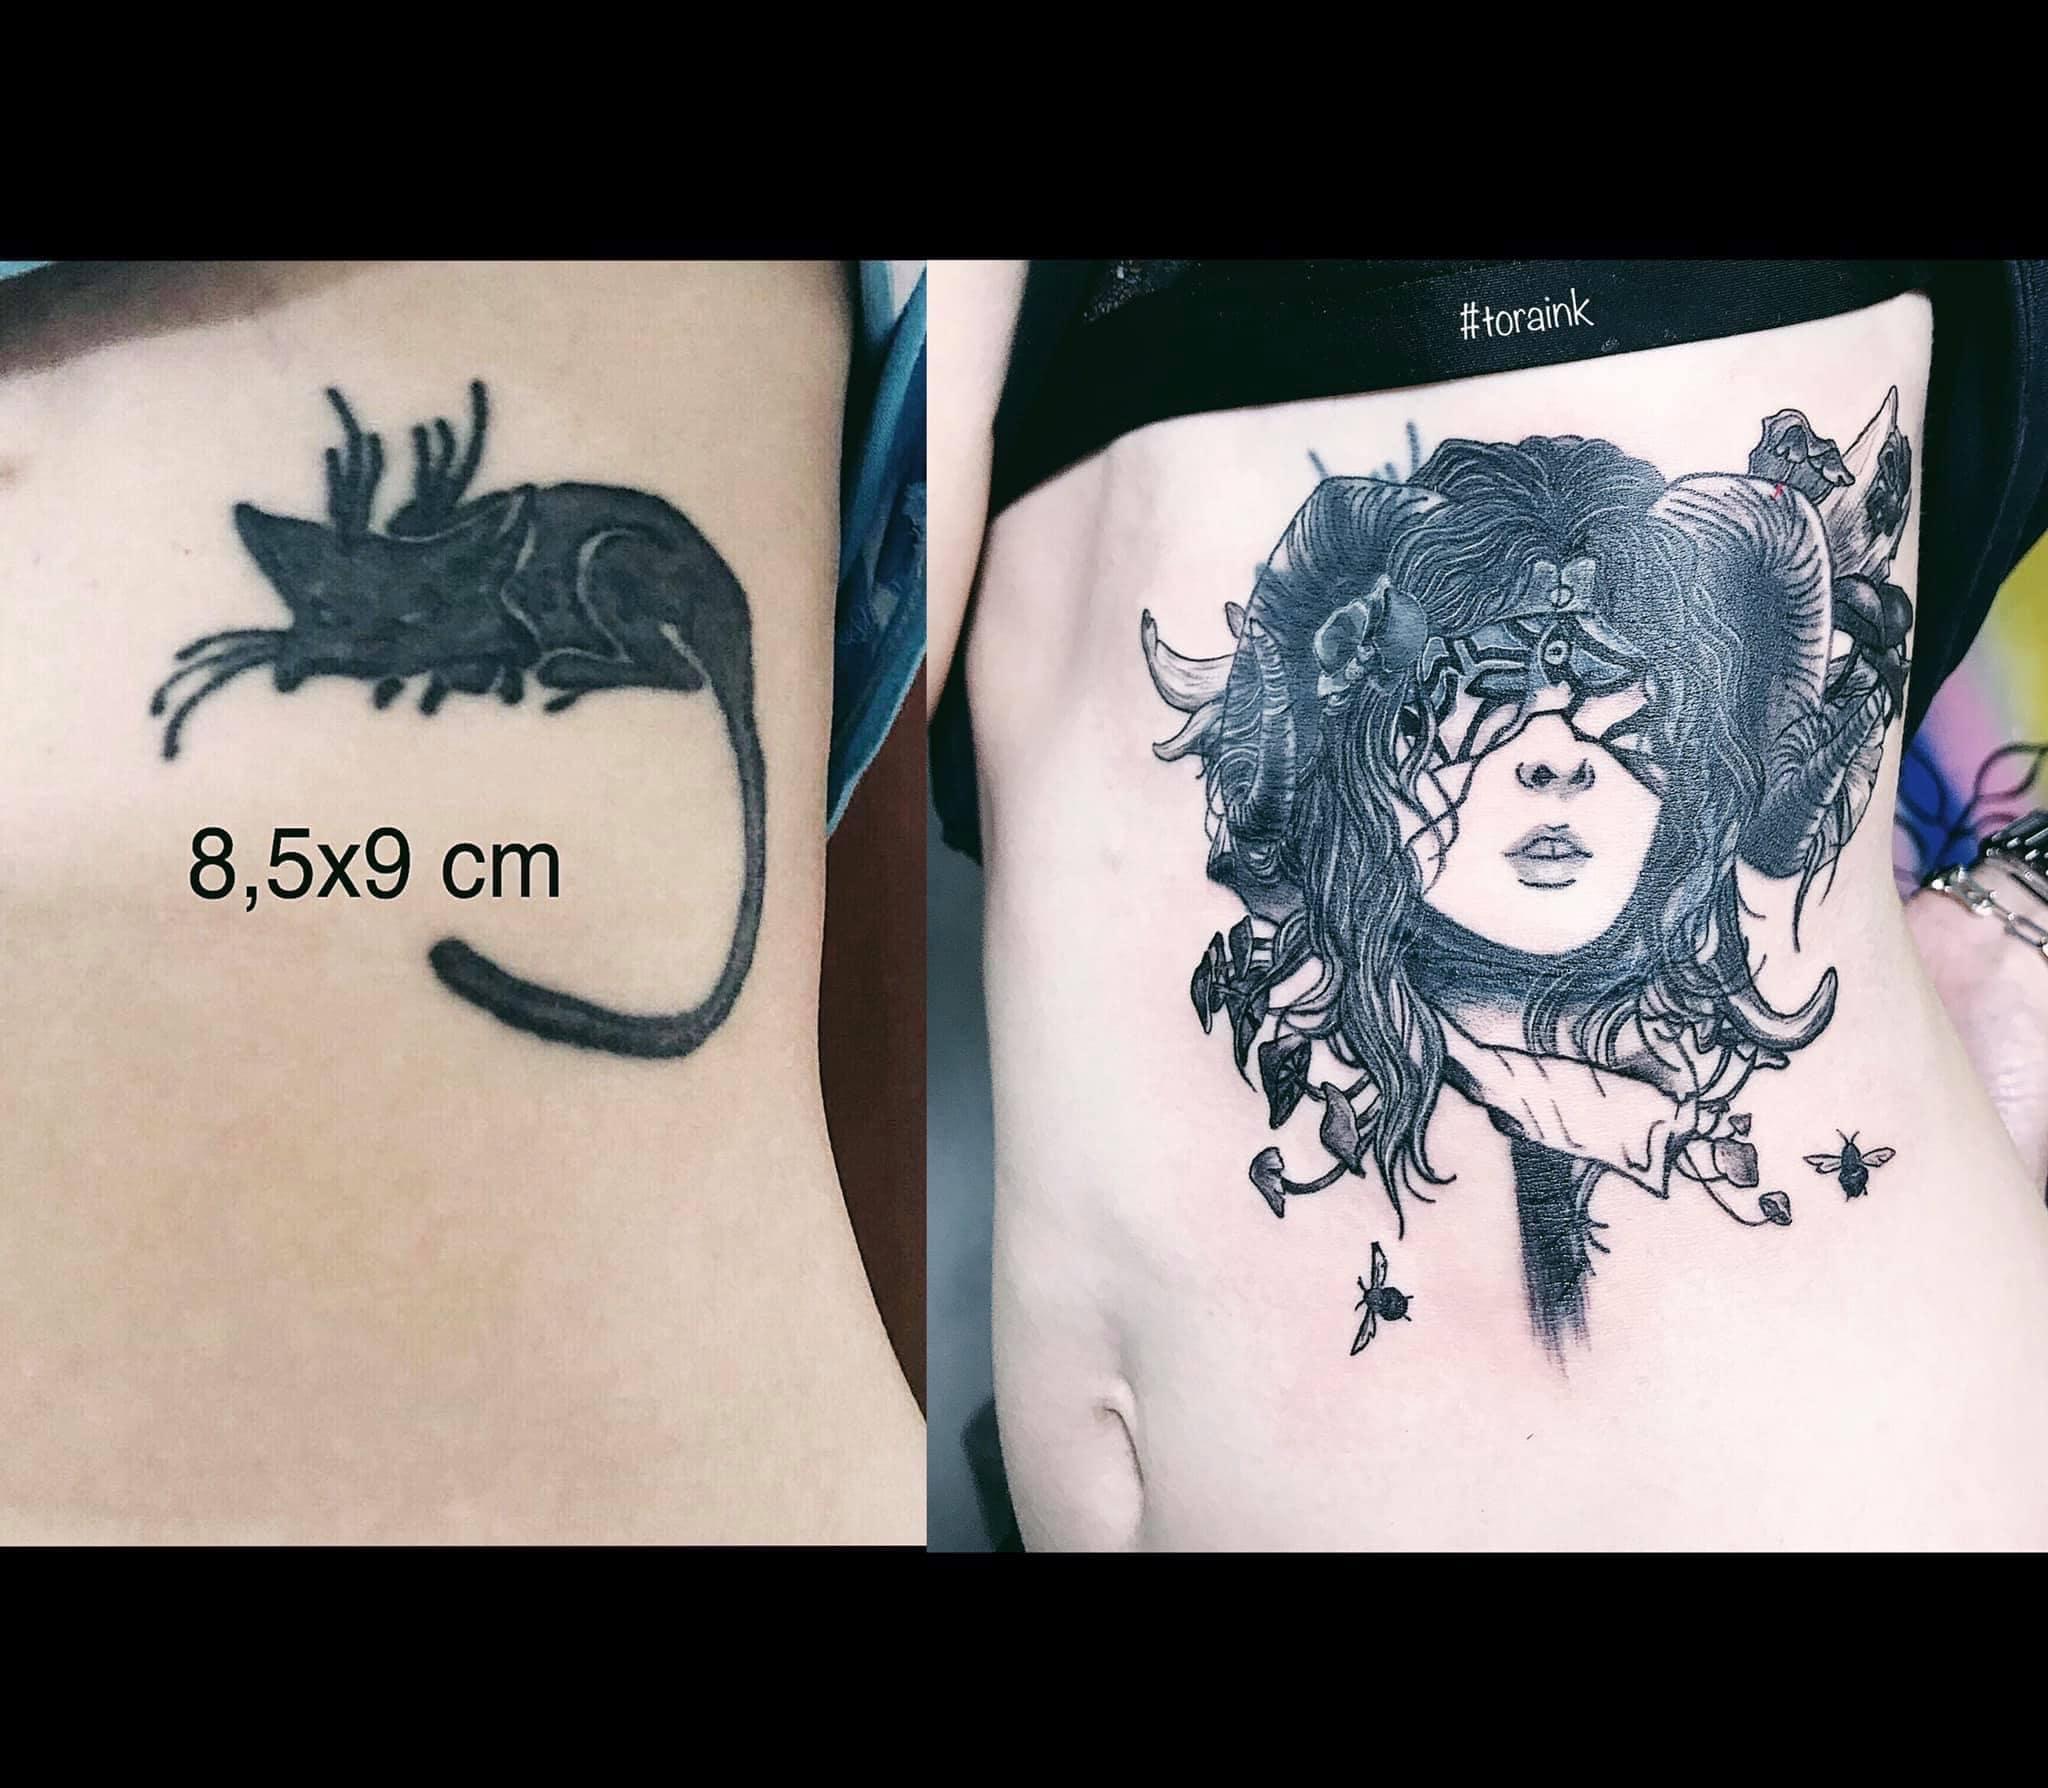 rast-ngo-tattoo-artist-cover-up-portrait